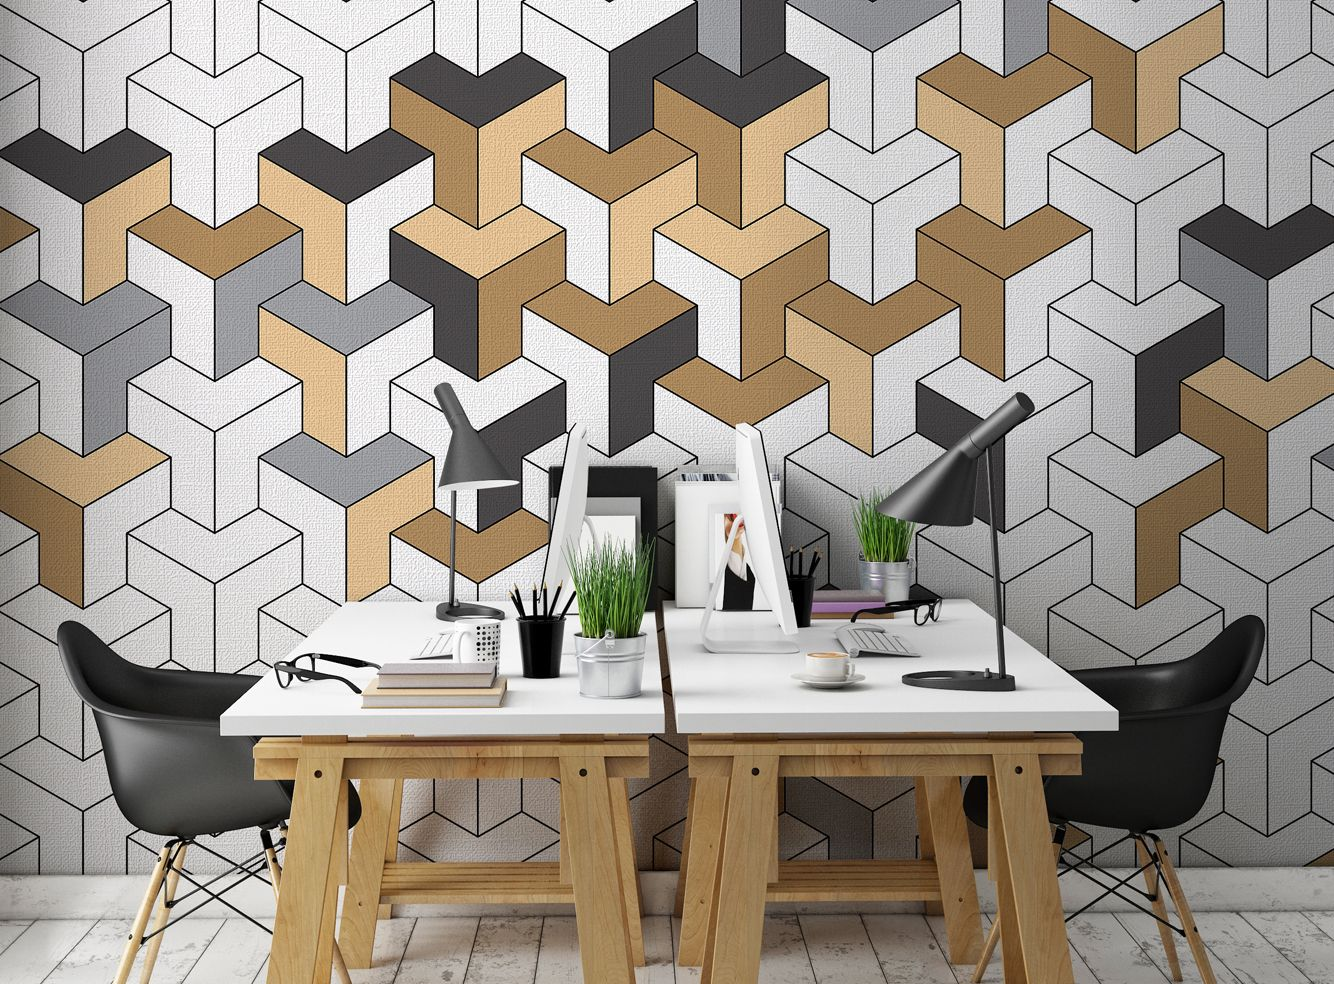 Geometric Wallpaper Textured Vinyl Wallpaper on non